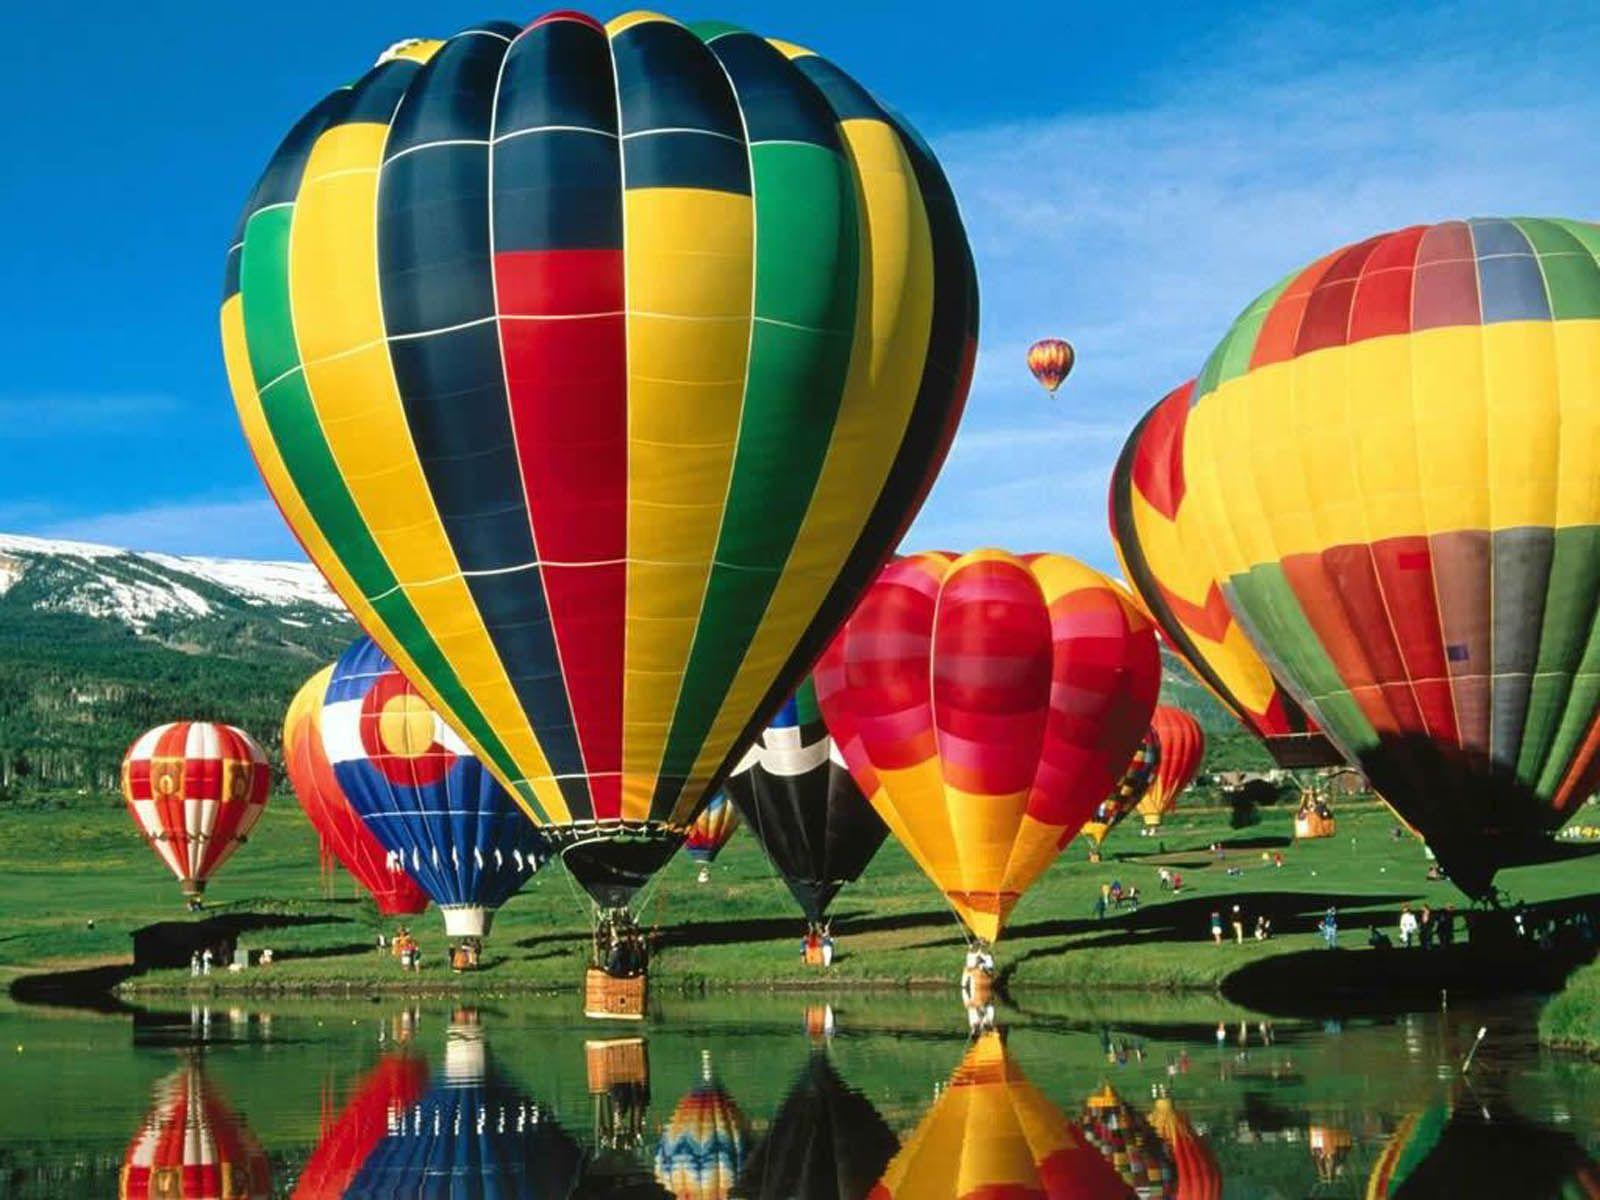 Gambar Gambar Balon Udara Yang Cantik Free Wallpapers